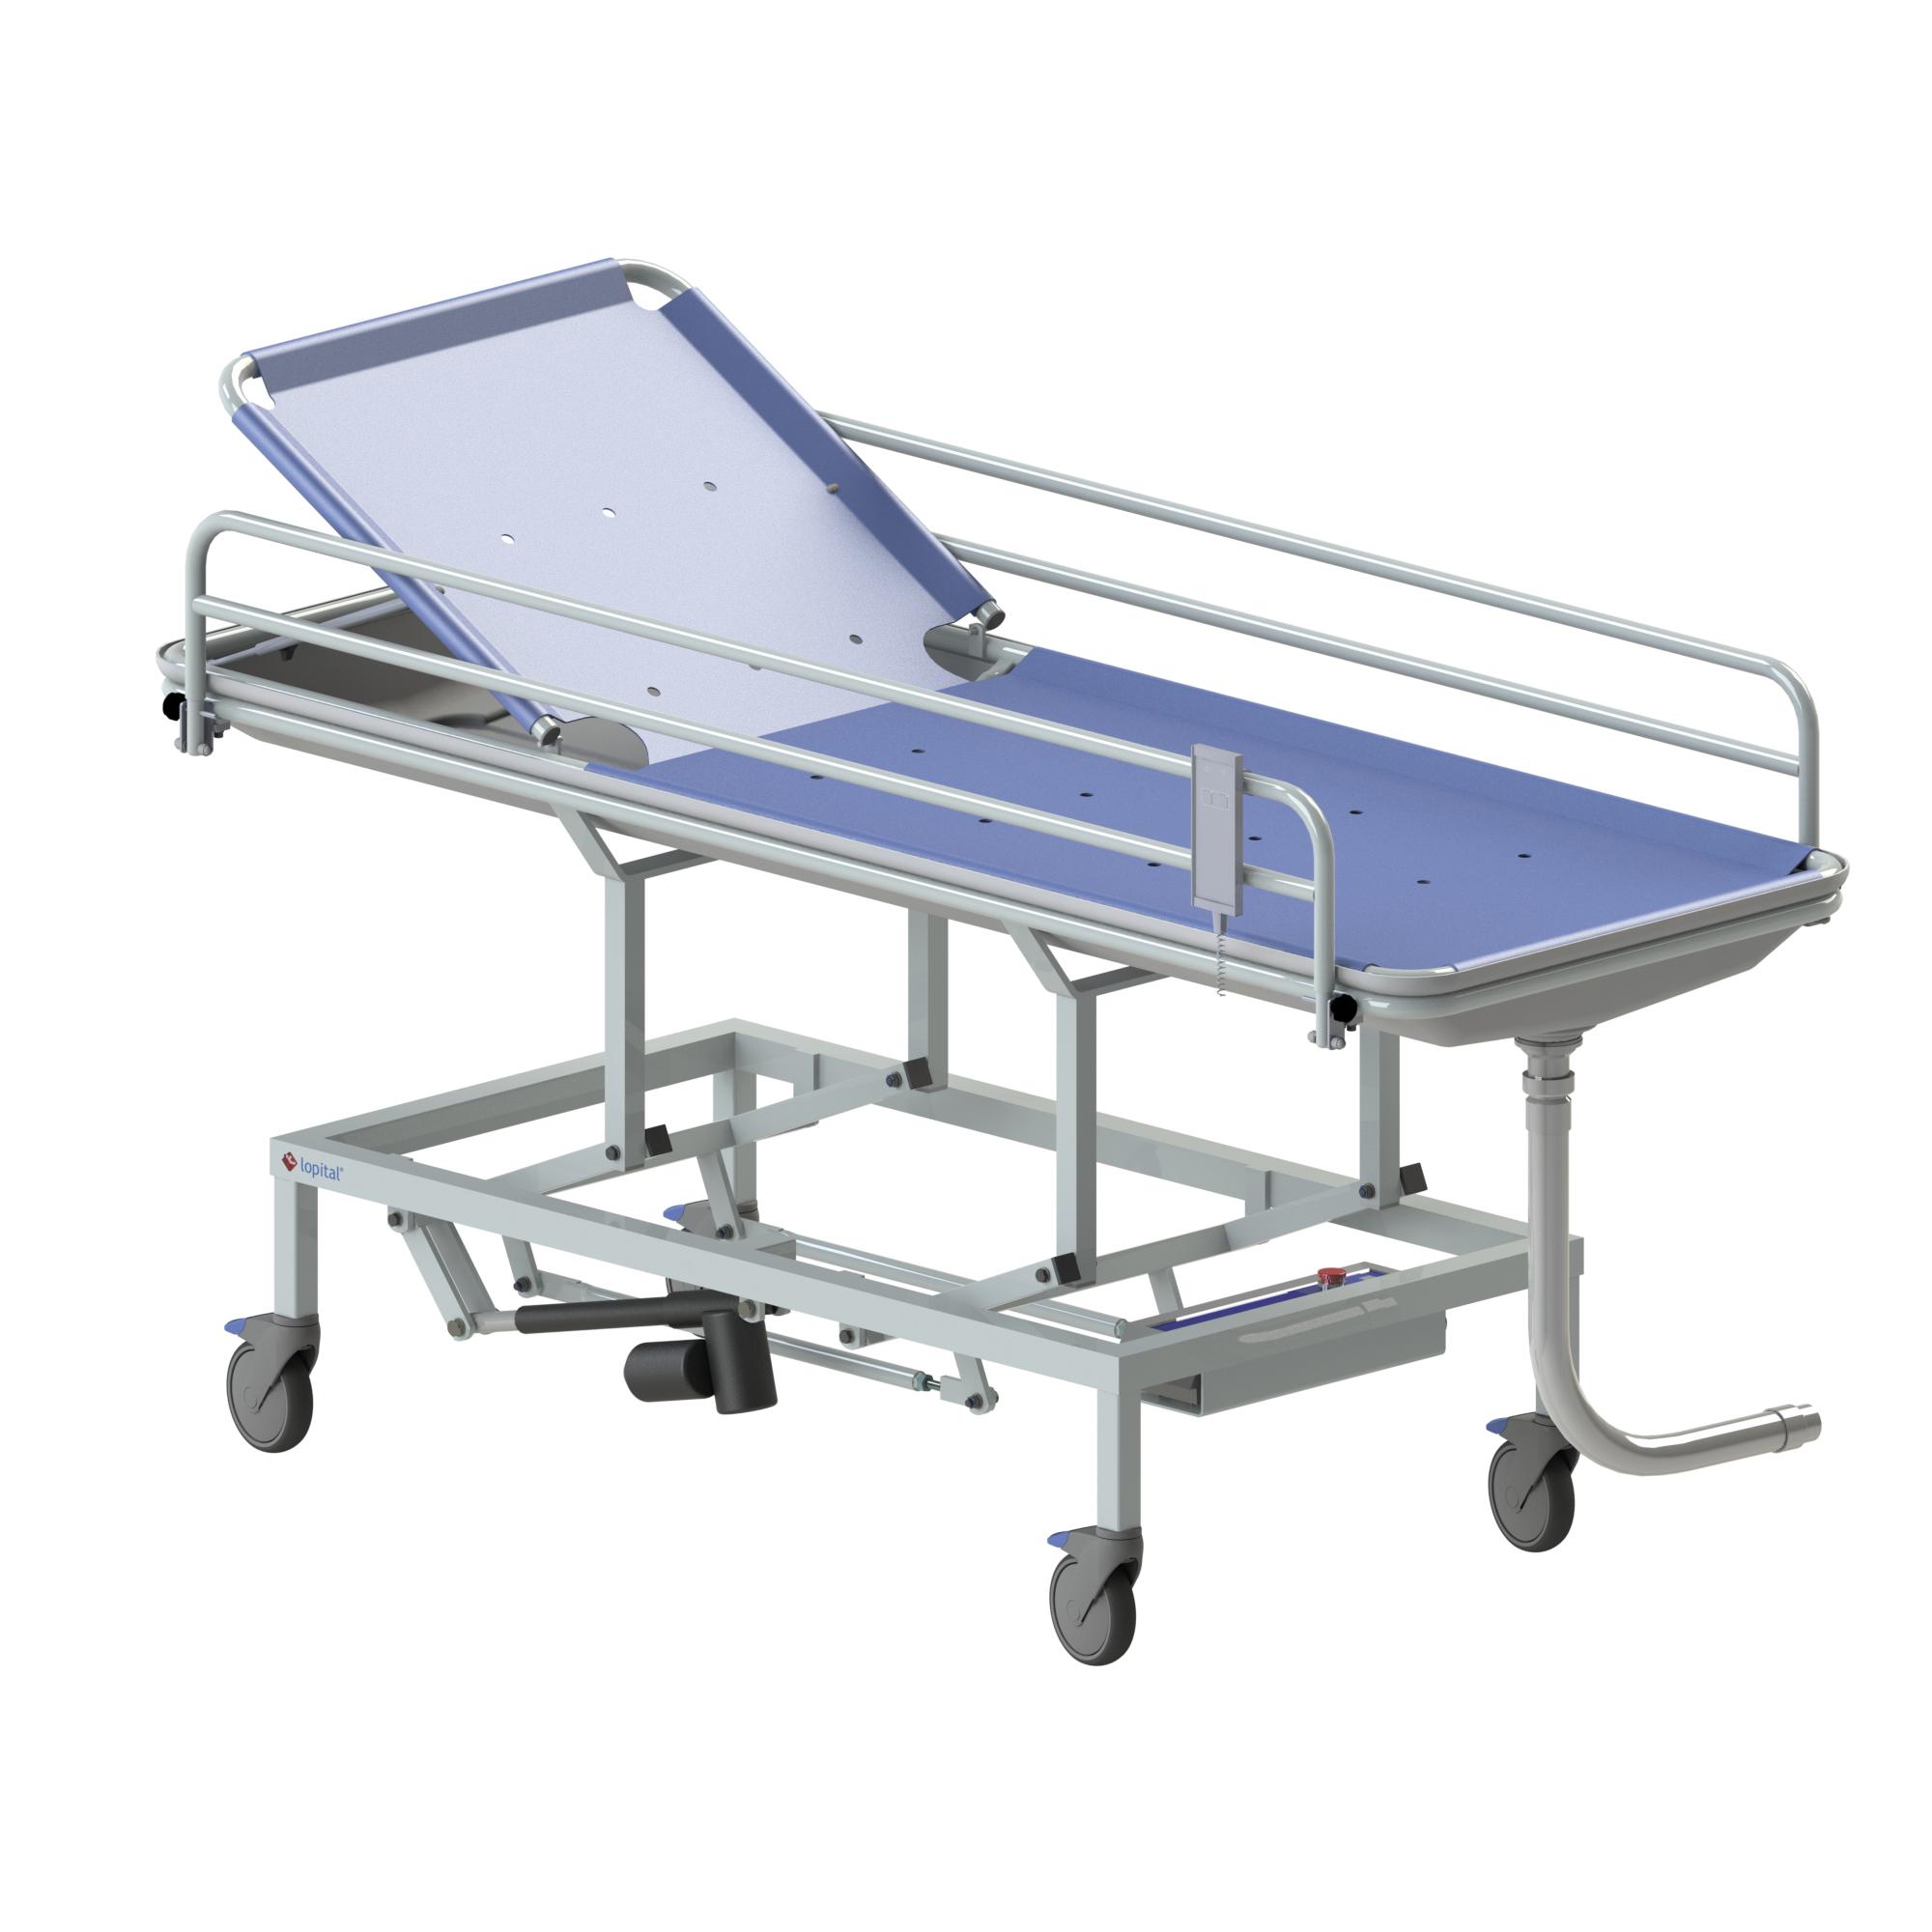 douche product procare medical lopital chair adjustable shower elexo flexo toilet toiletstoel trolley